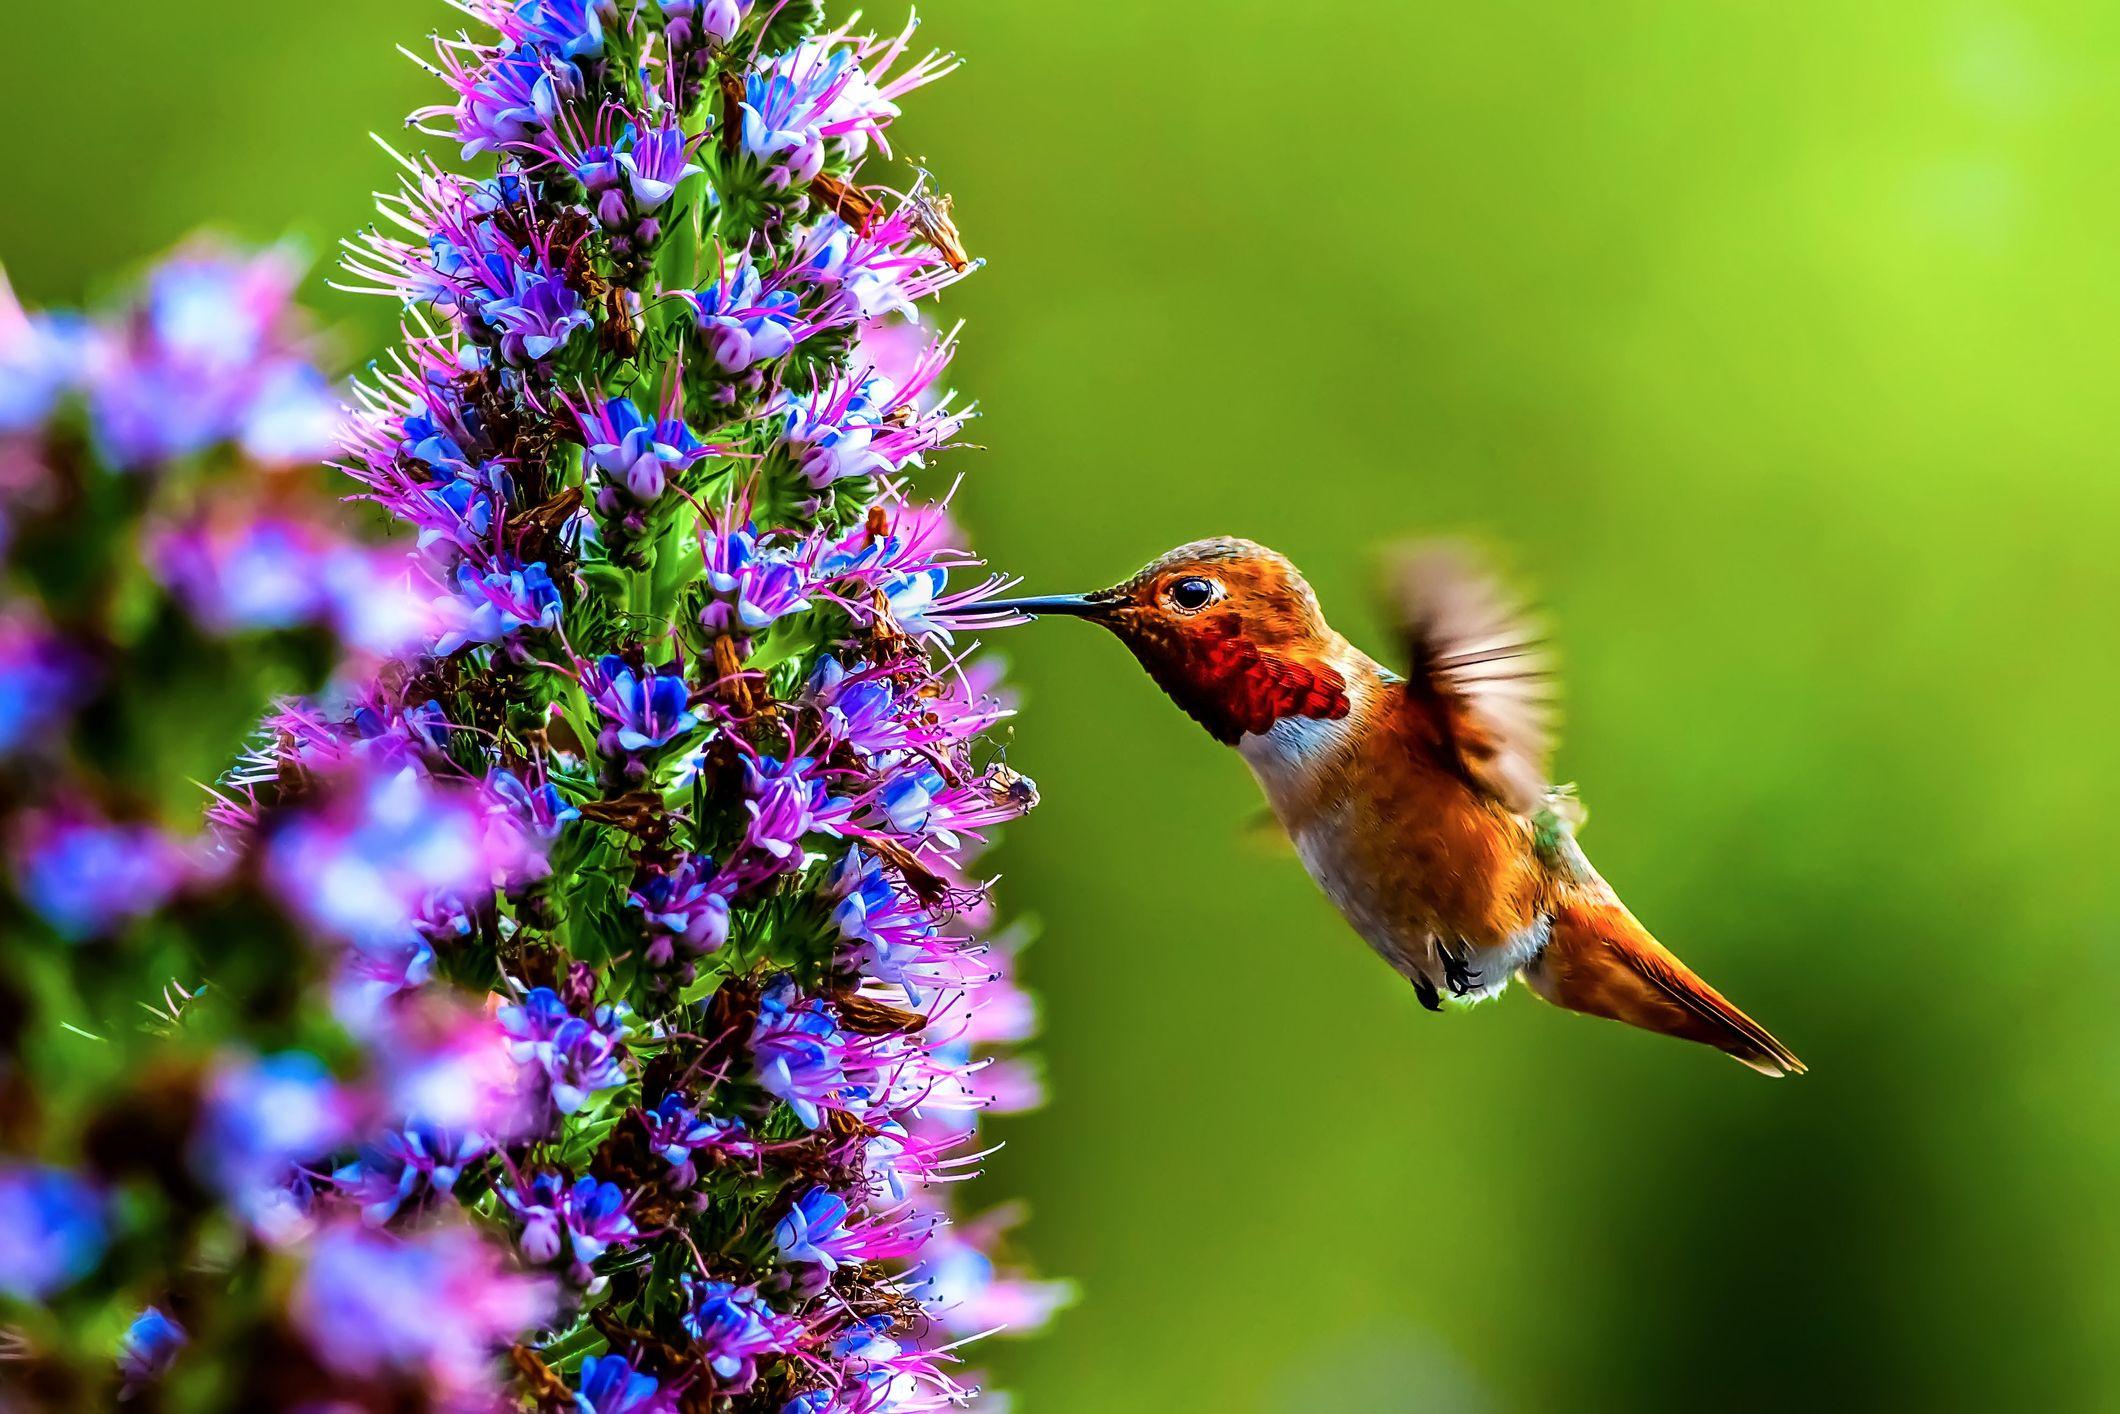 12 Flowers That Attract Hummingbirds Best Blooms For Pollinators